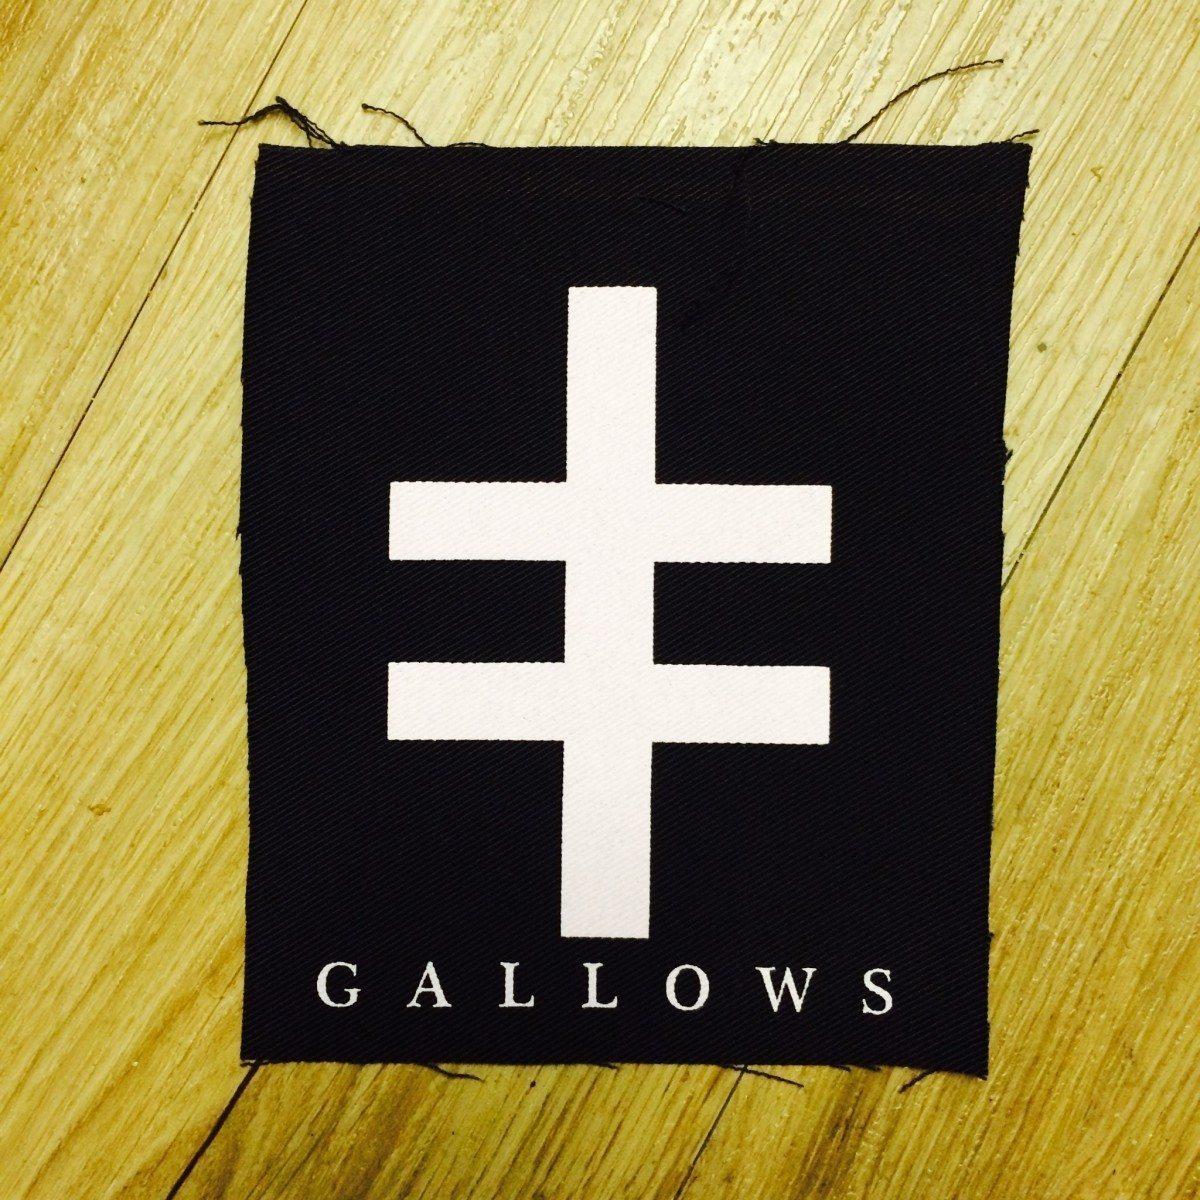 Gallows - Cross Of Lorraine Cloth Patch - Venn Records